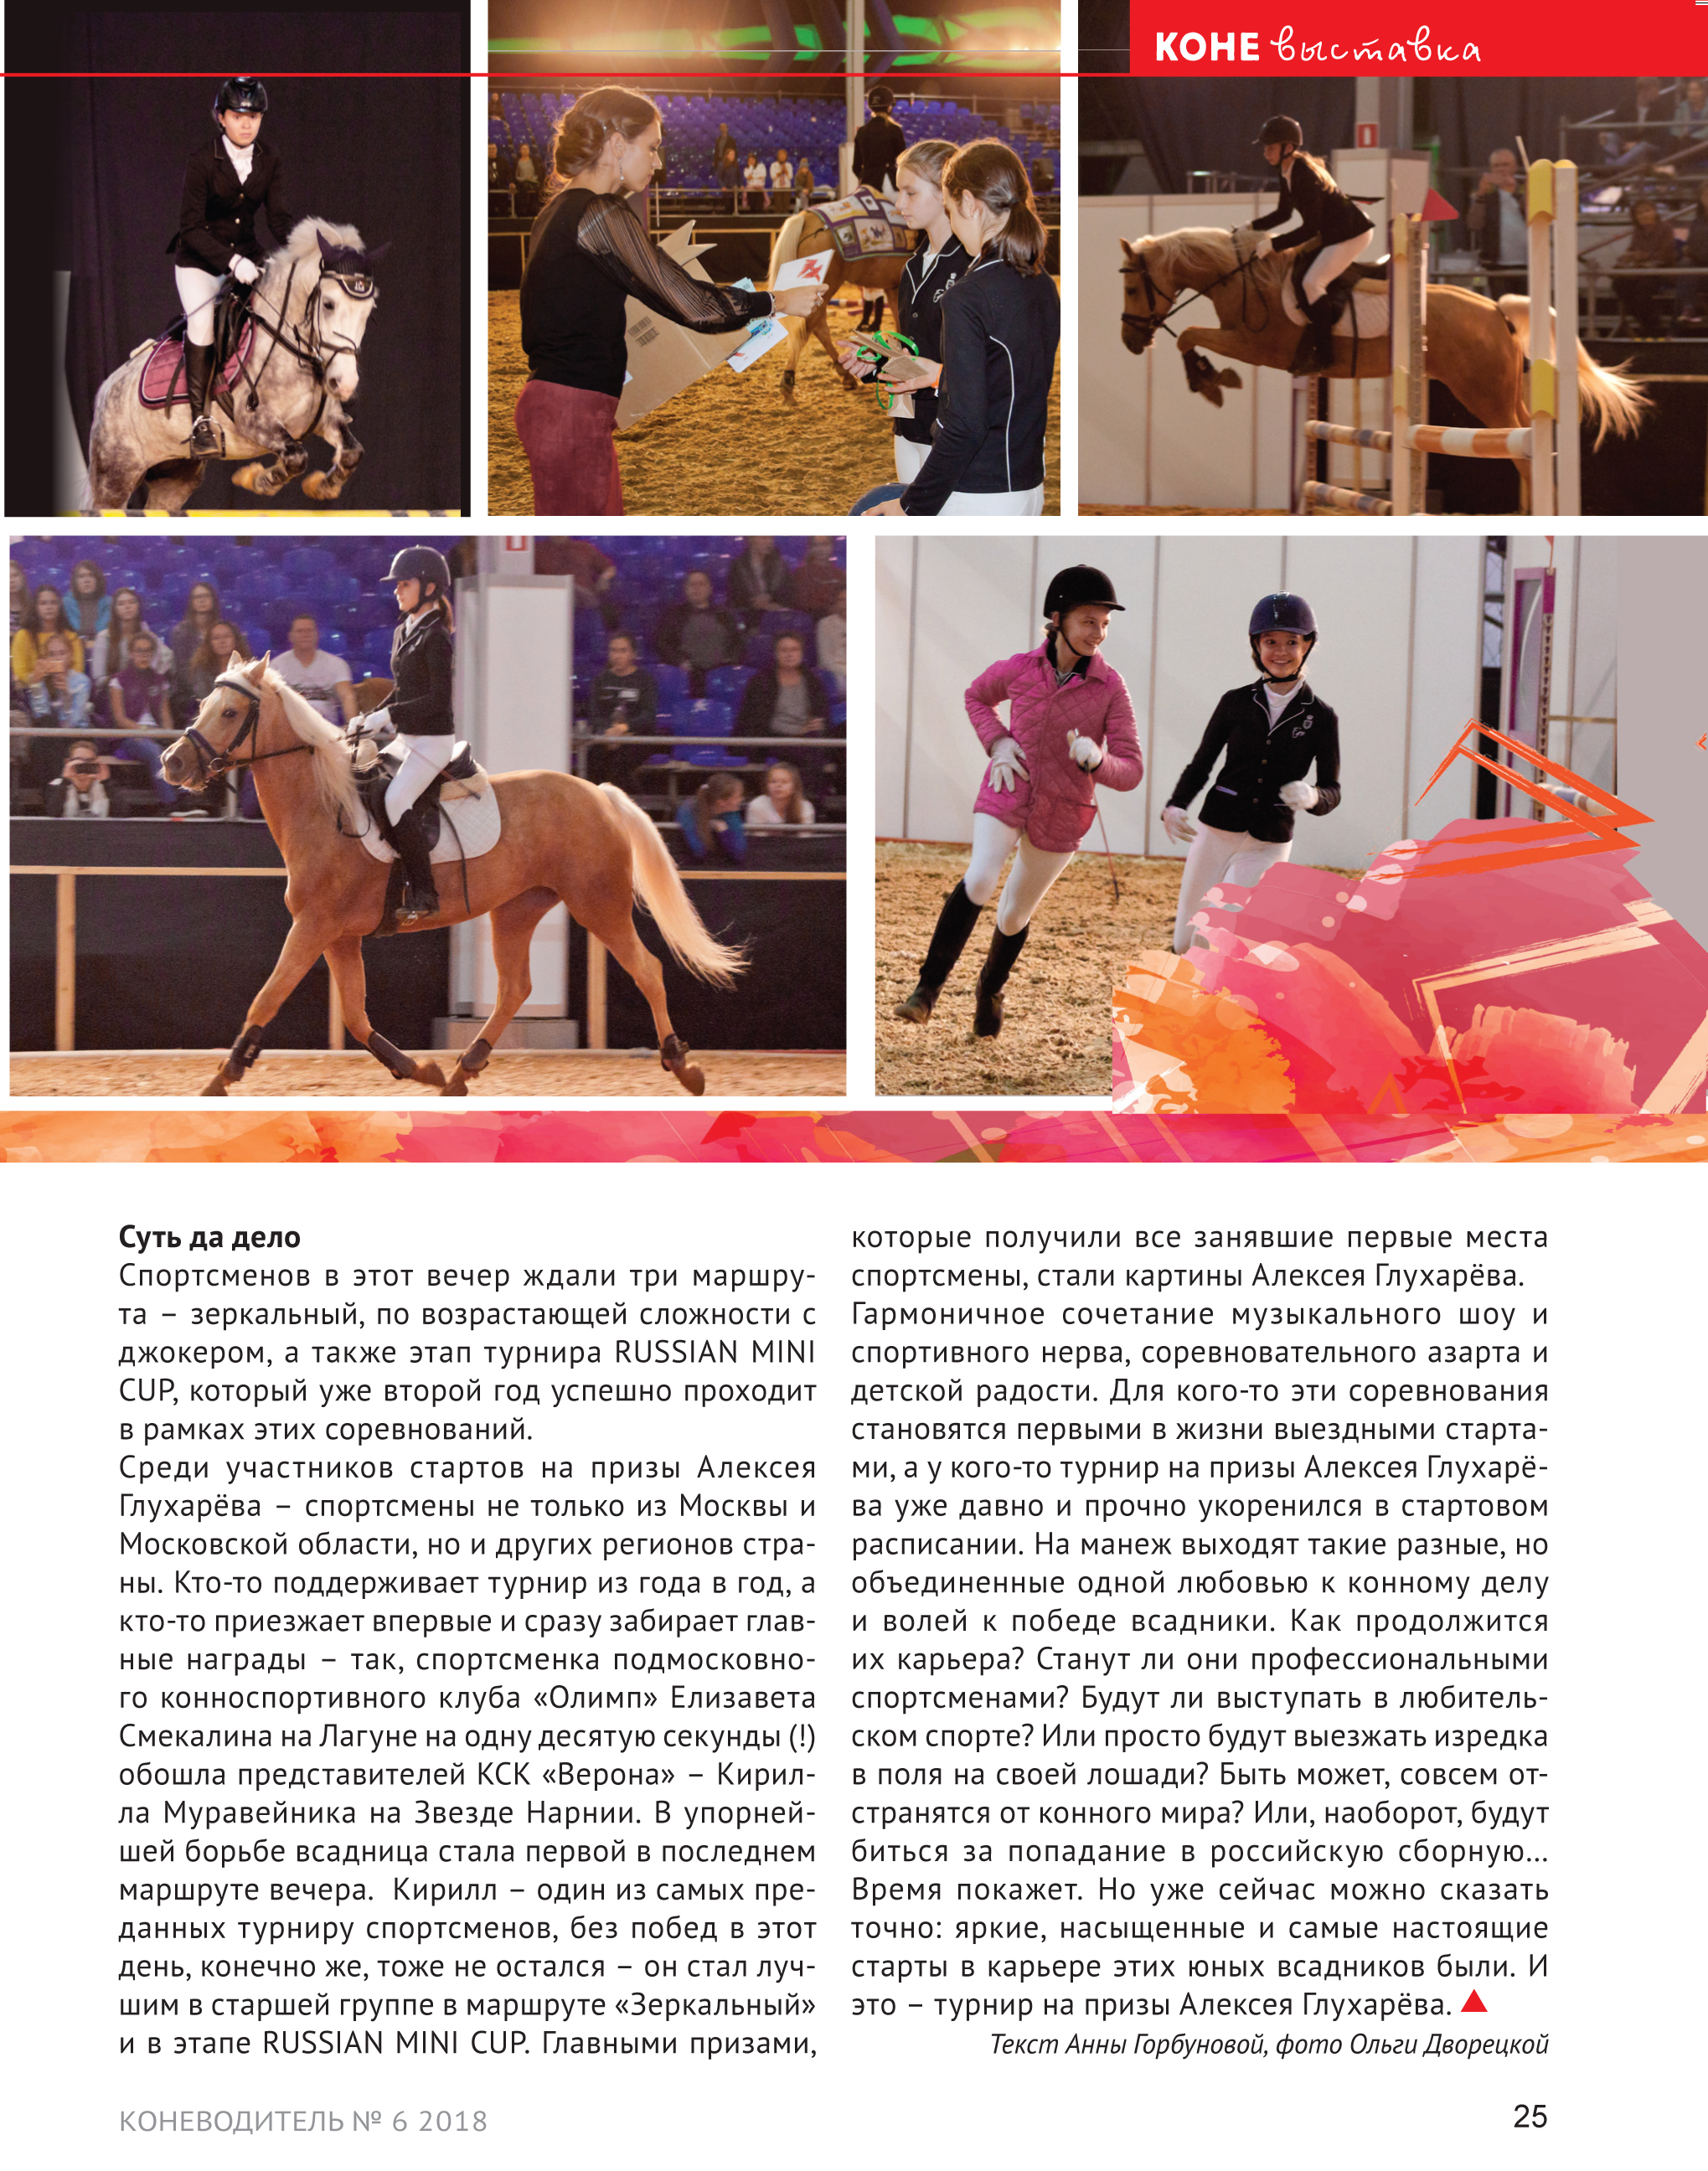 Book KONEVODITEL 62018 print-25